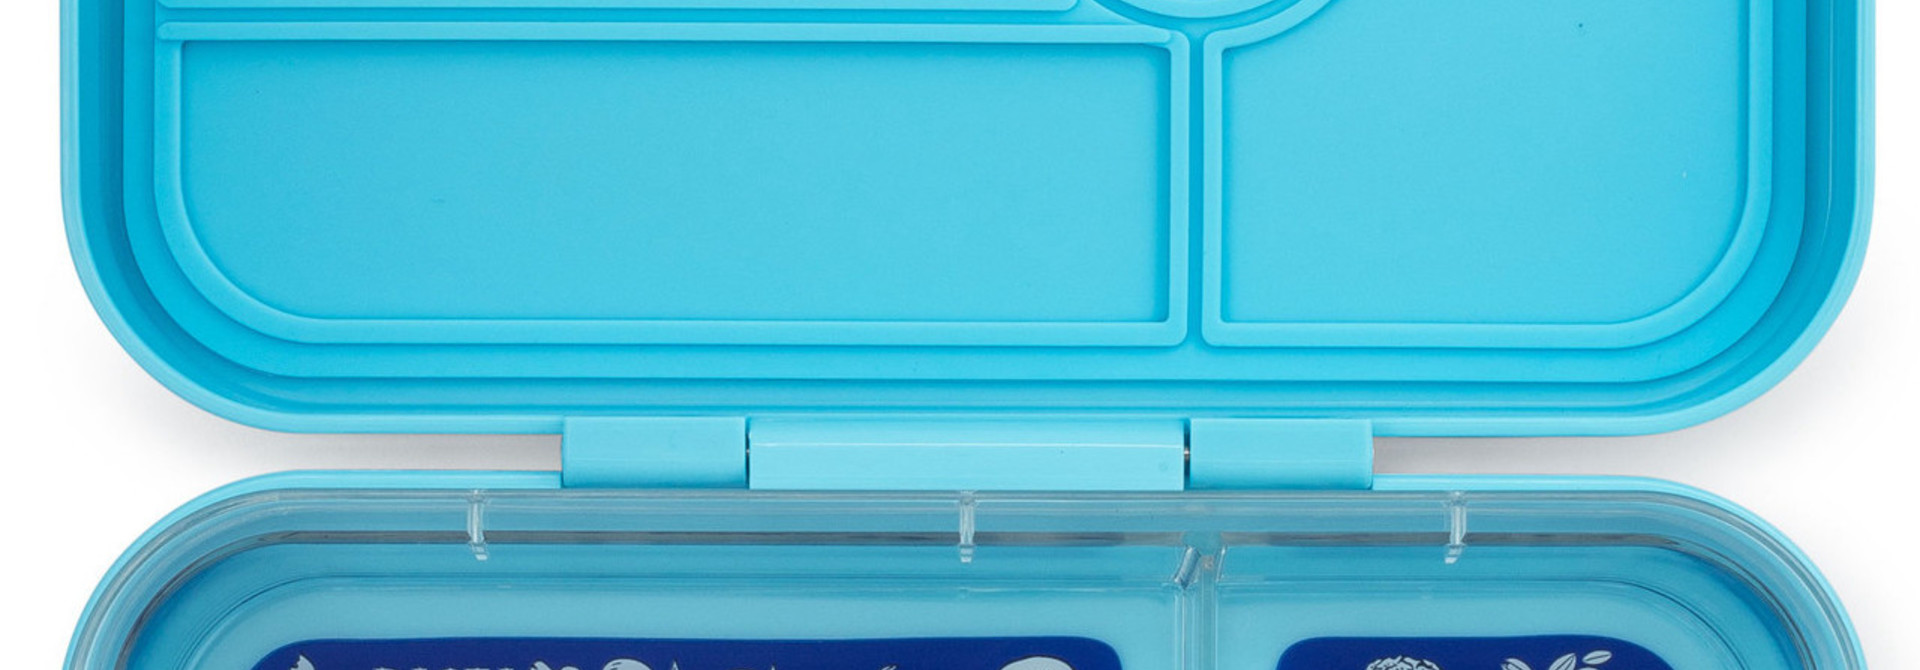 Yumbox Tapas XL lunchbox Nevis blue / Bon appetit tray 5-sections